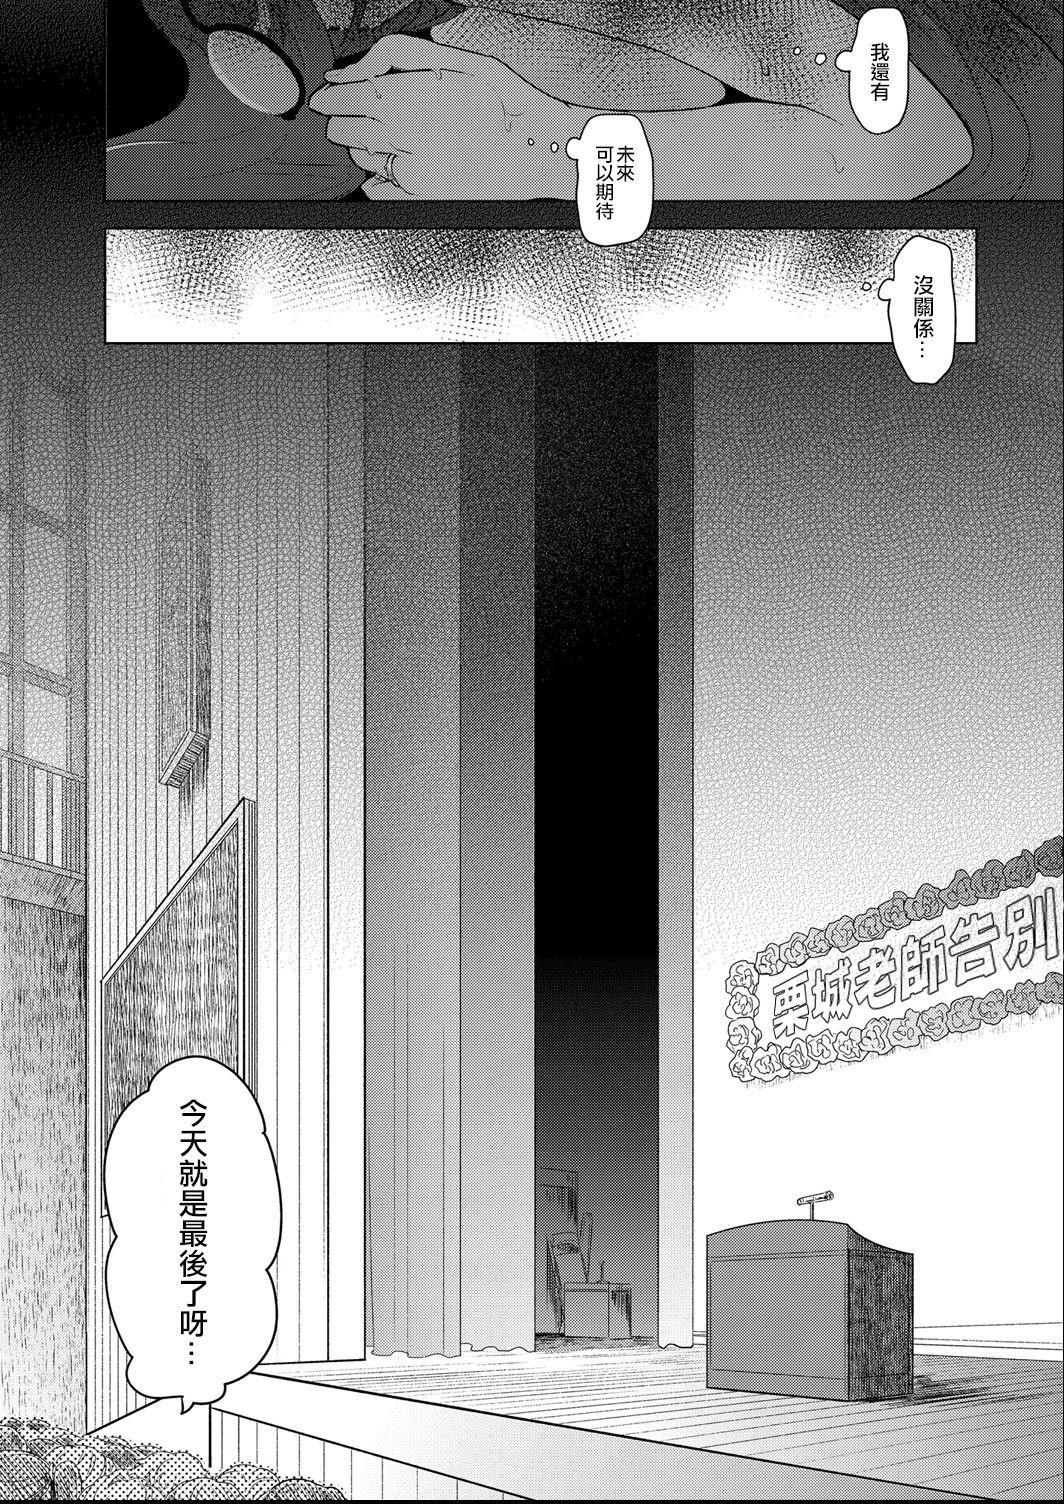 [Cyori Mokki] Geinou  Katsudou wa Yuri Ecchi no atode ch.1-3 丨藝能活動要在百合H後 第1-2話  [Chinese] [沒有漢化] [Digital] 35